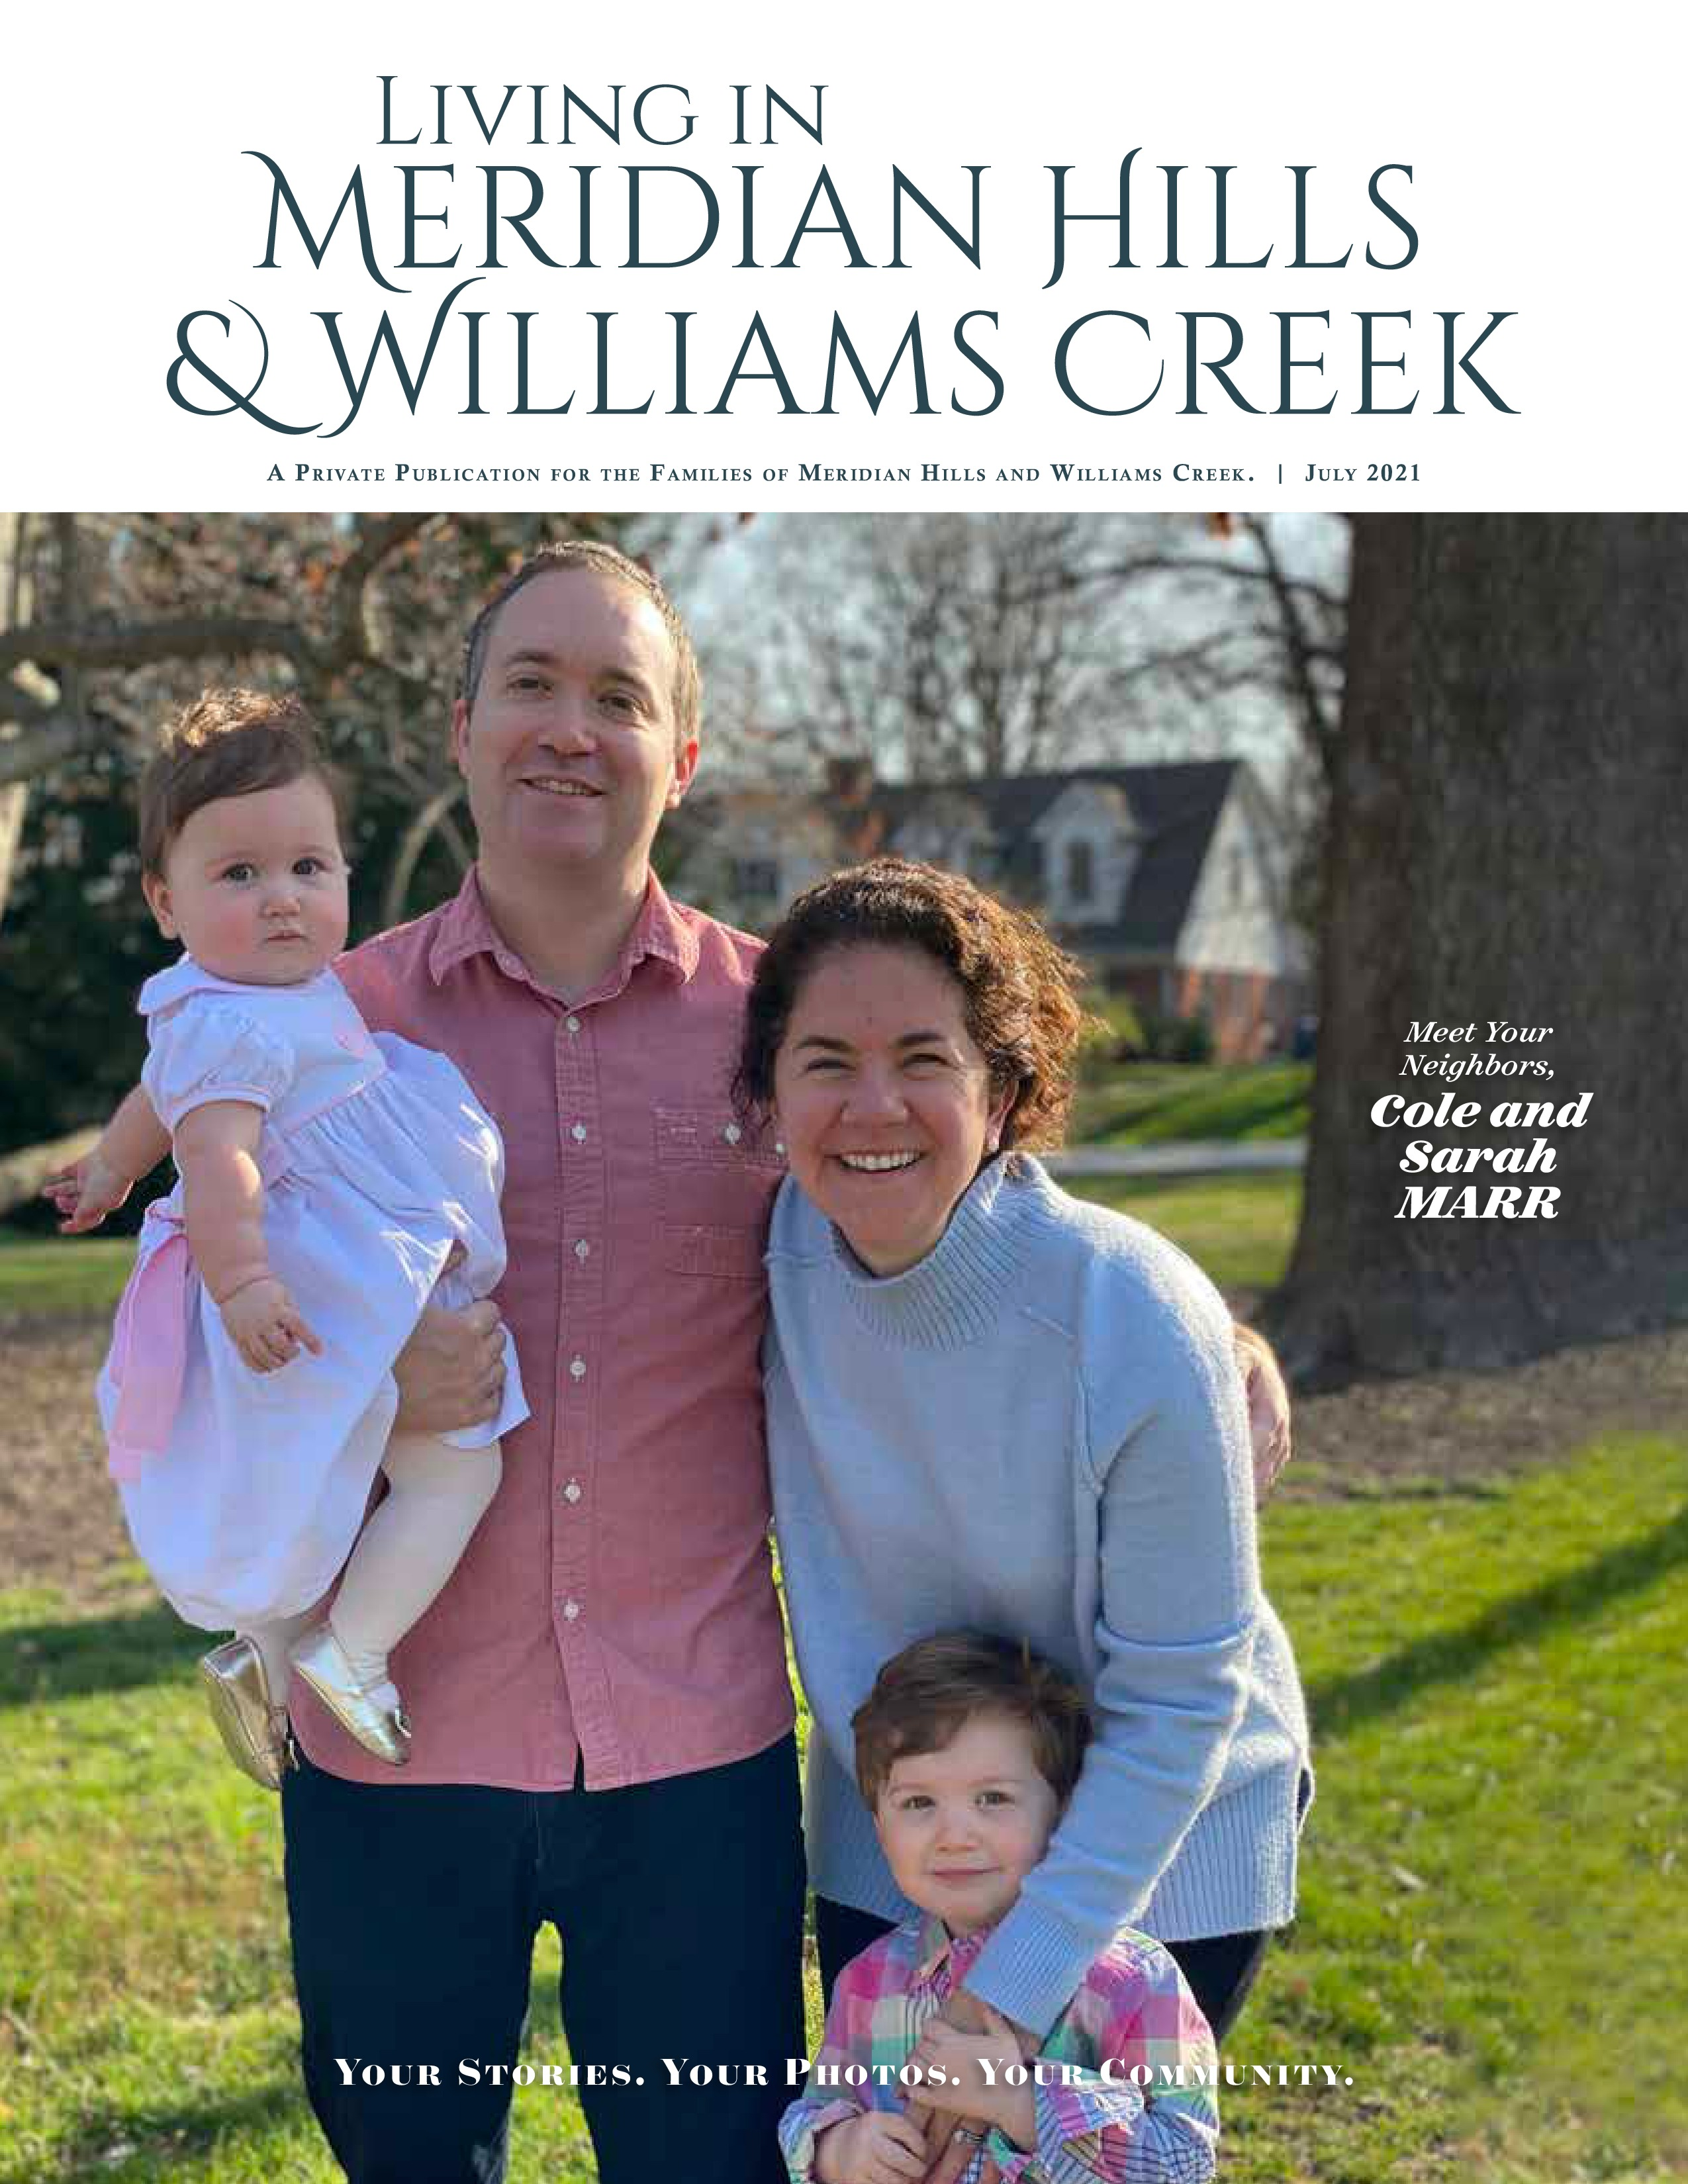 Living in Meridian Hills & Williams Creek 2021-07-01